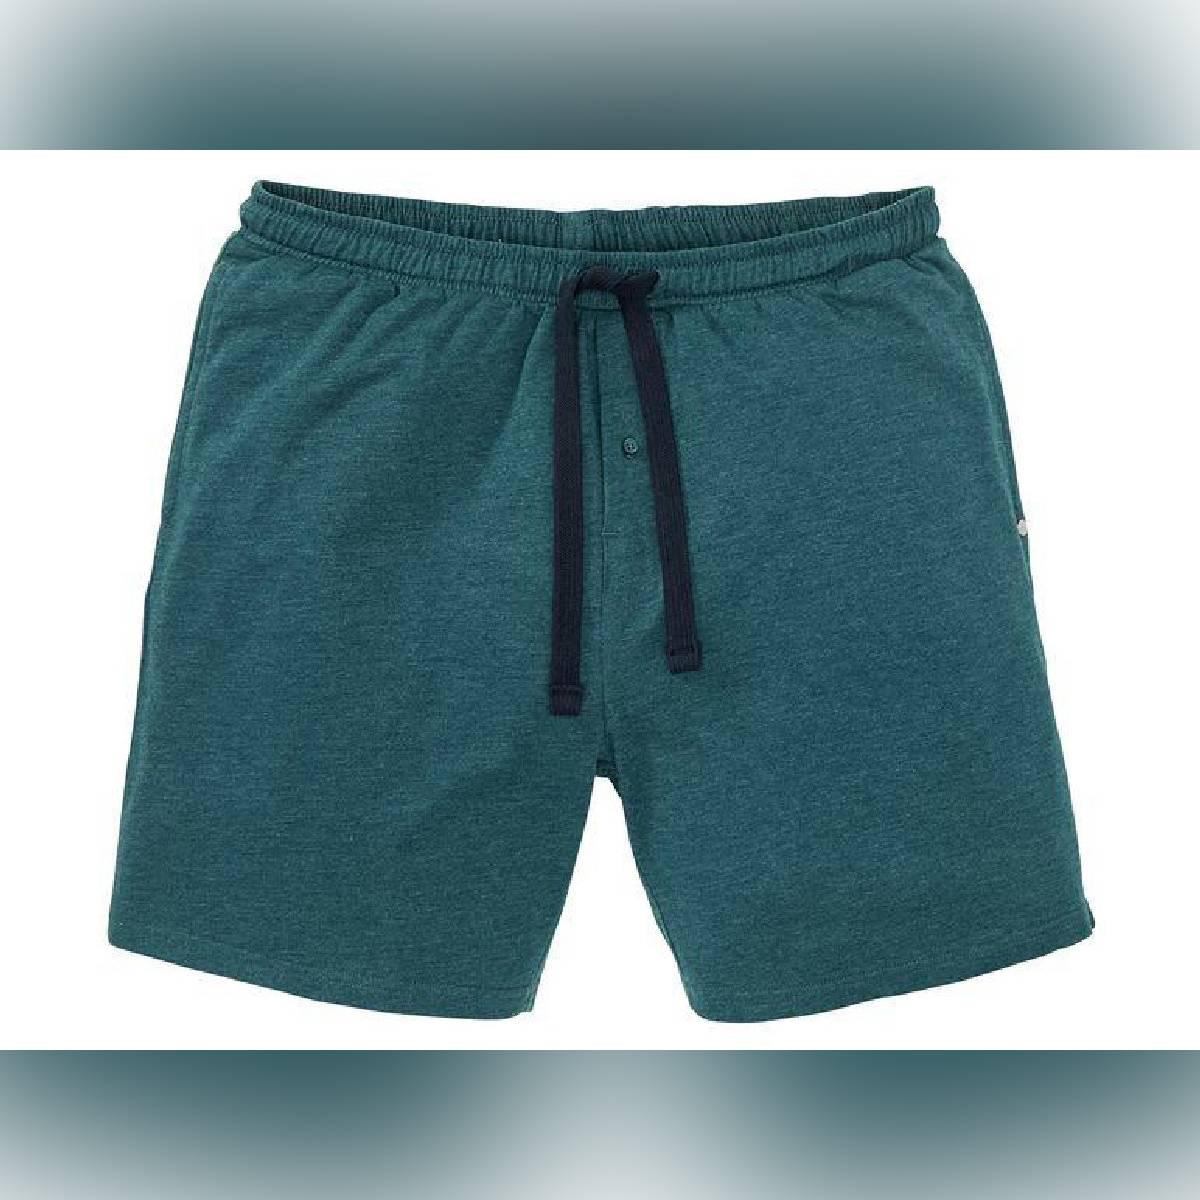 The Factory Stock - Comfortable Premium Single Jersey Shorts/Loungewear for Men